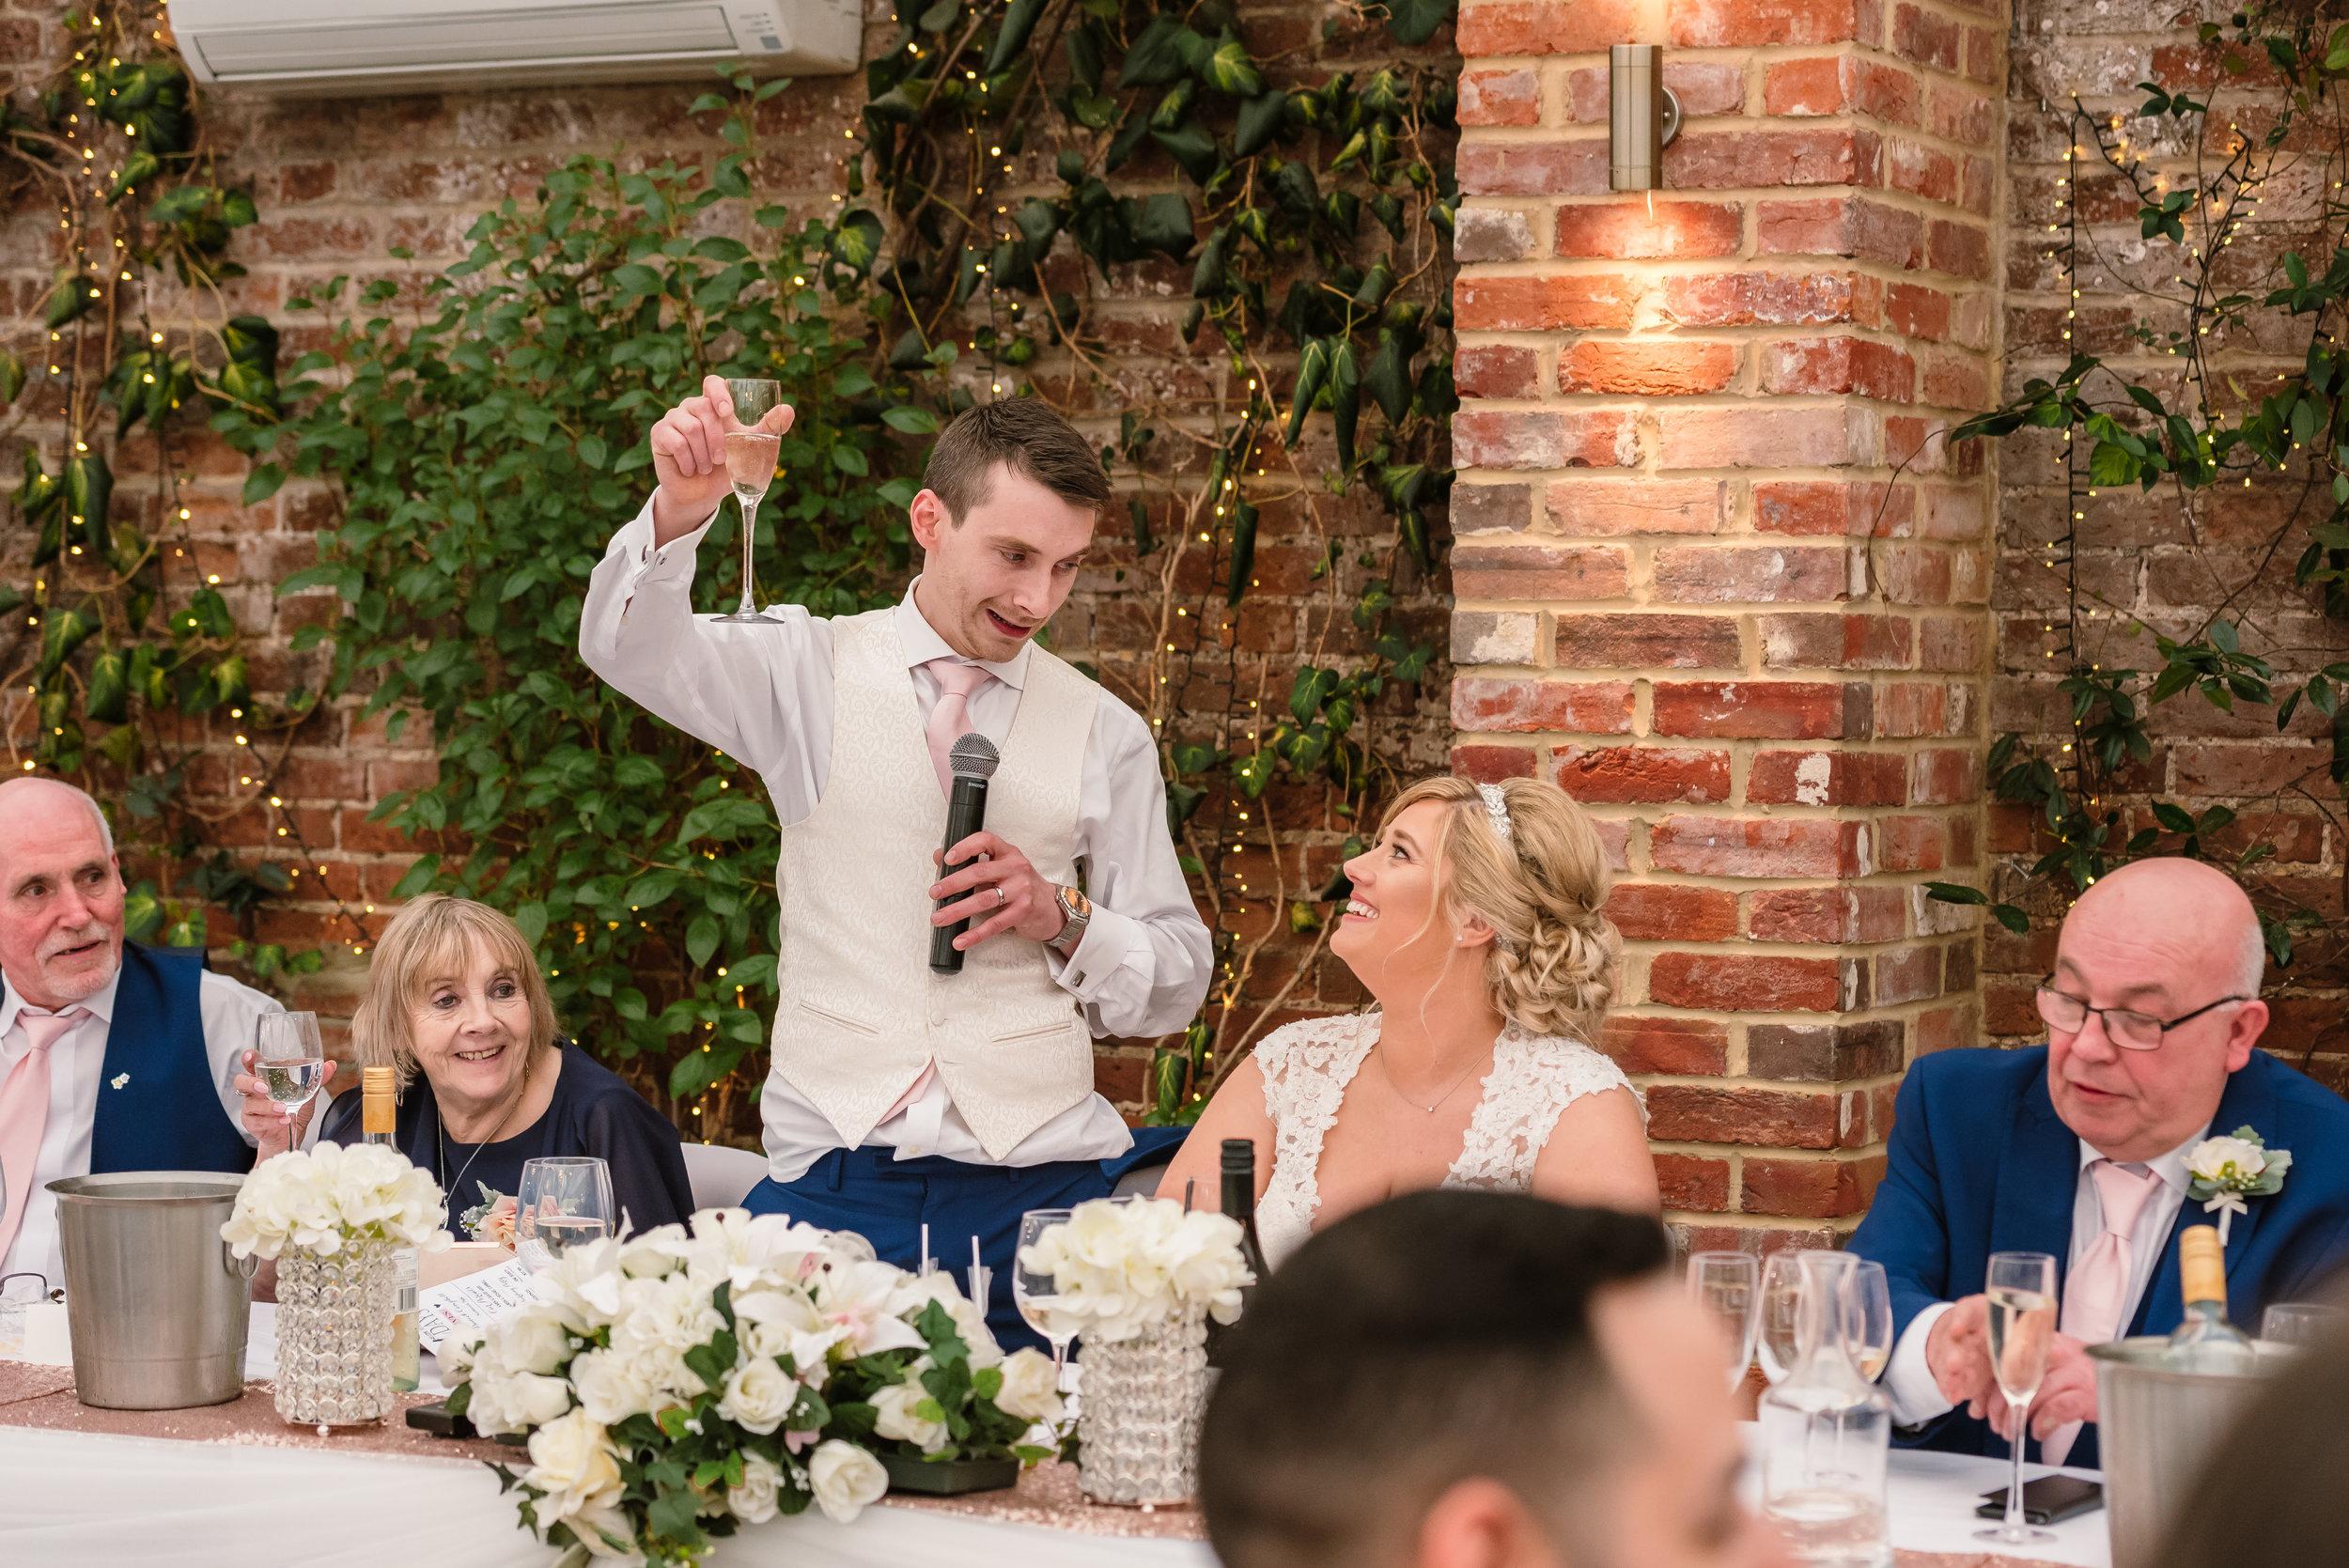 Sarah-Fishlock-Photography : Hampshire-wedding-photographer-hampshire : fleet-wedding-photographer-fleet : Northbrook-Park-Wedding-Photographer : Northbrook-Park-Wedding-Venue : natural-wedding-photographer-hampshire-898.jpg